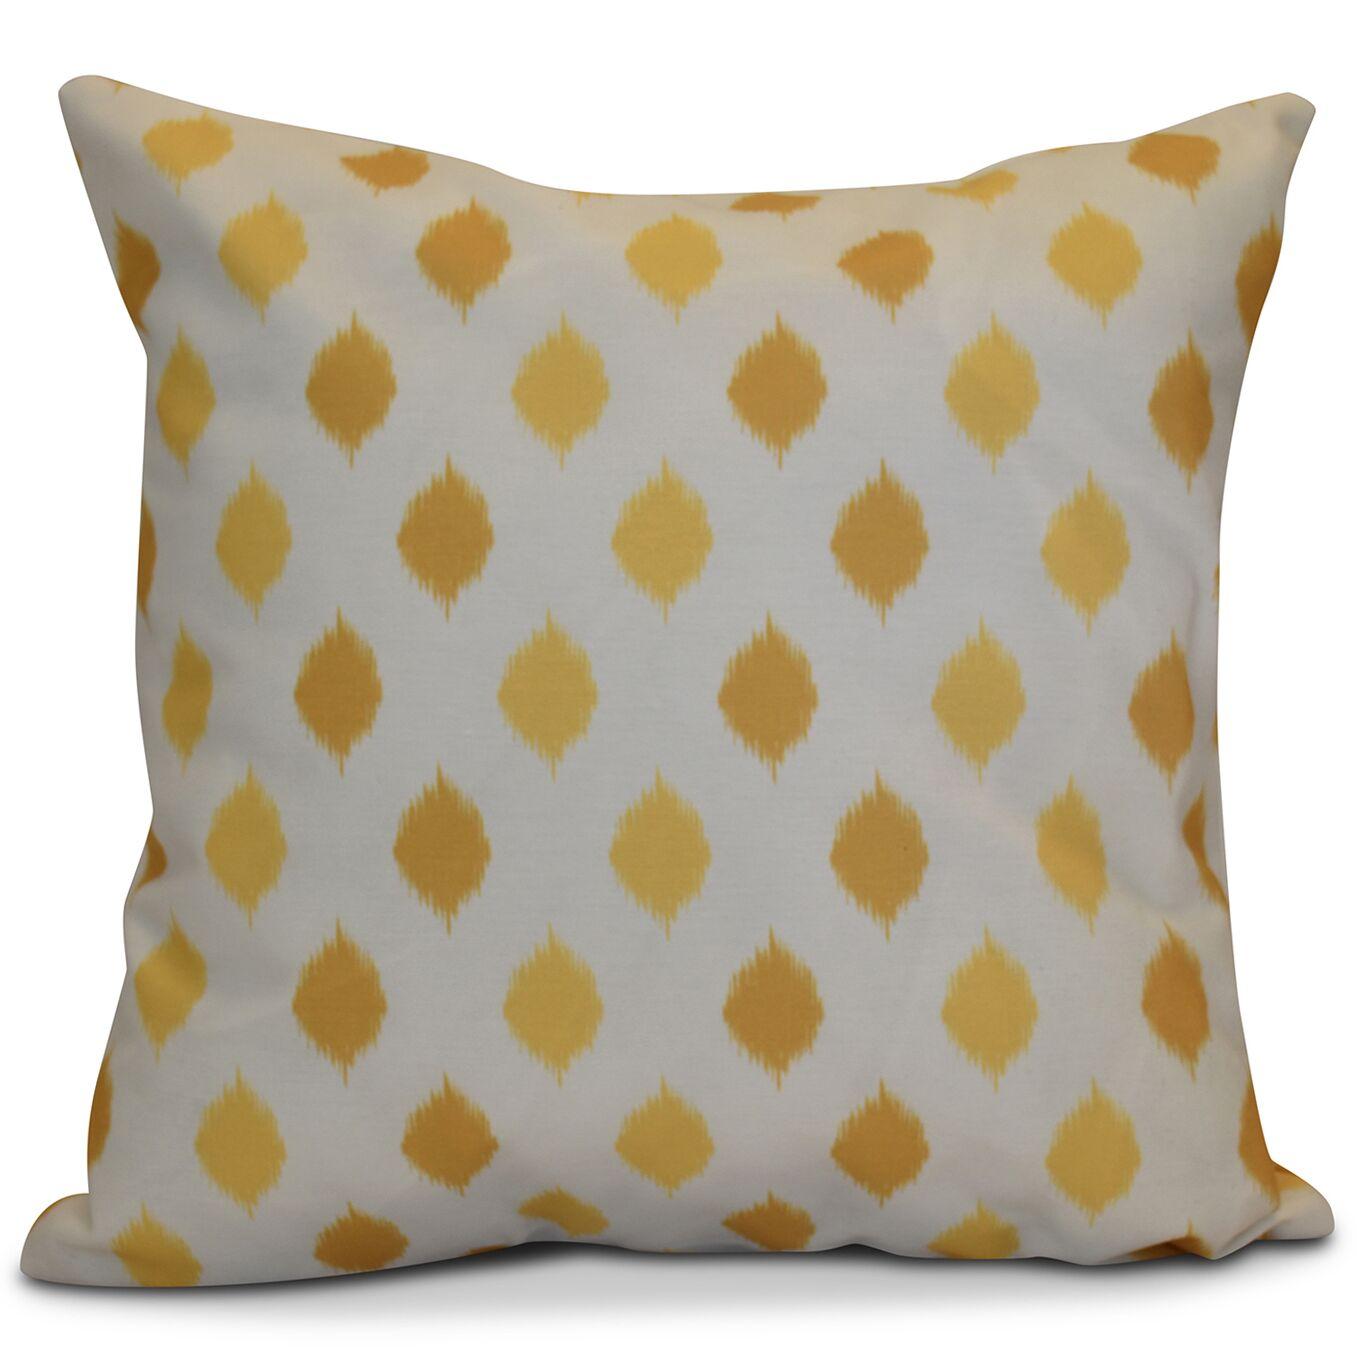 Hanukkah 2016 Decorative Holiday Geometric Outdoor Throw Pillow Size: 20